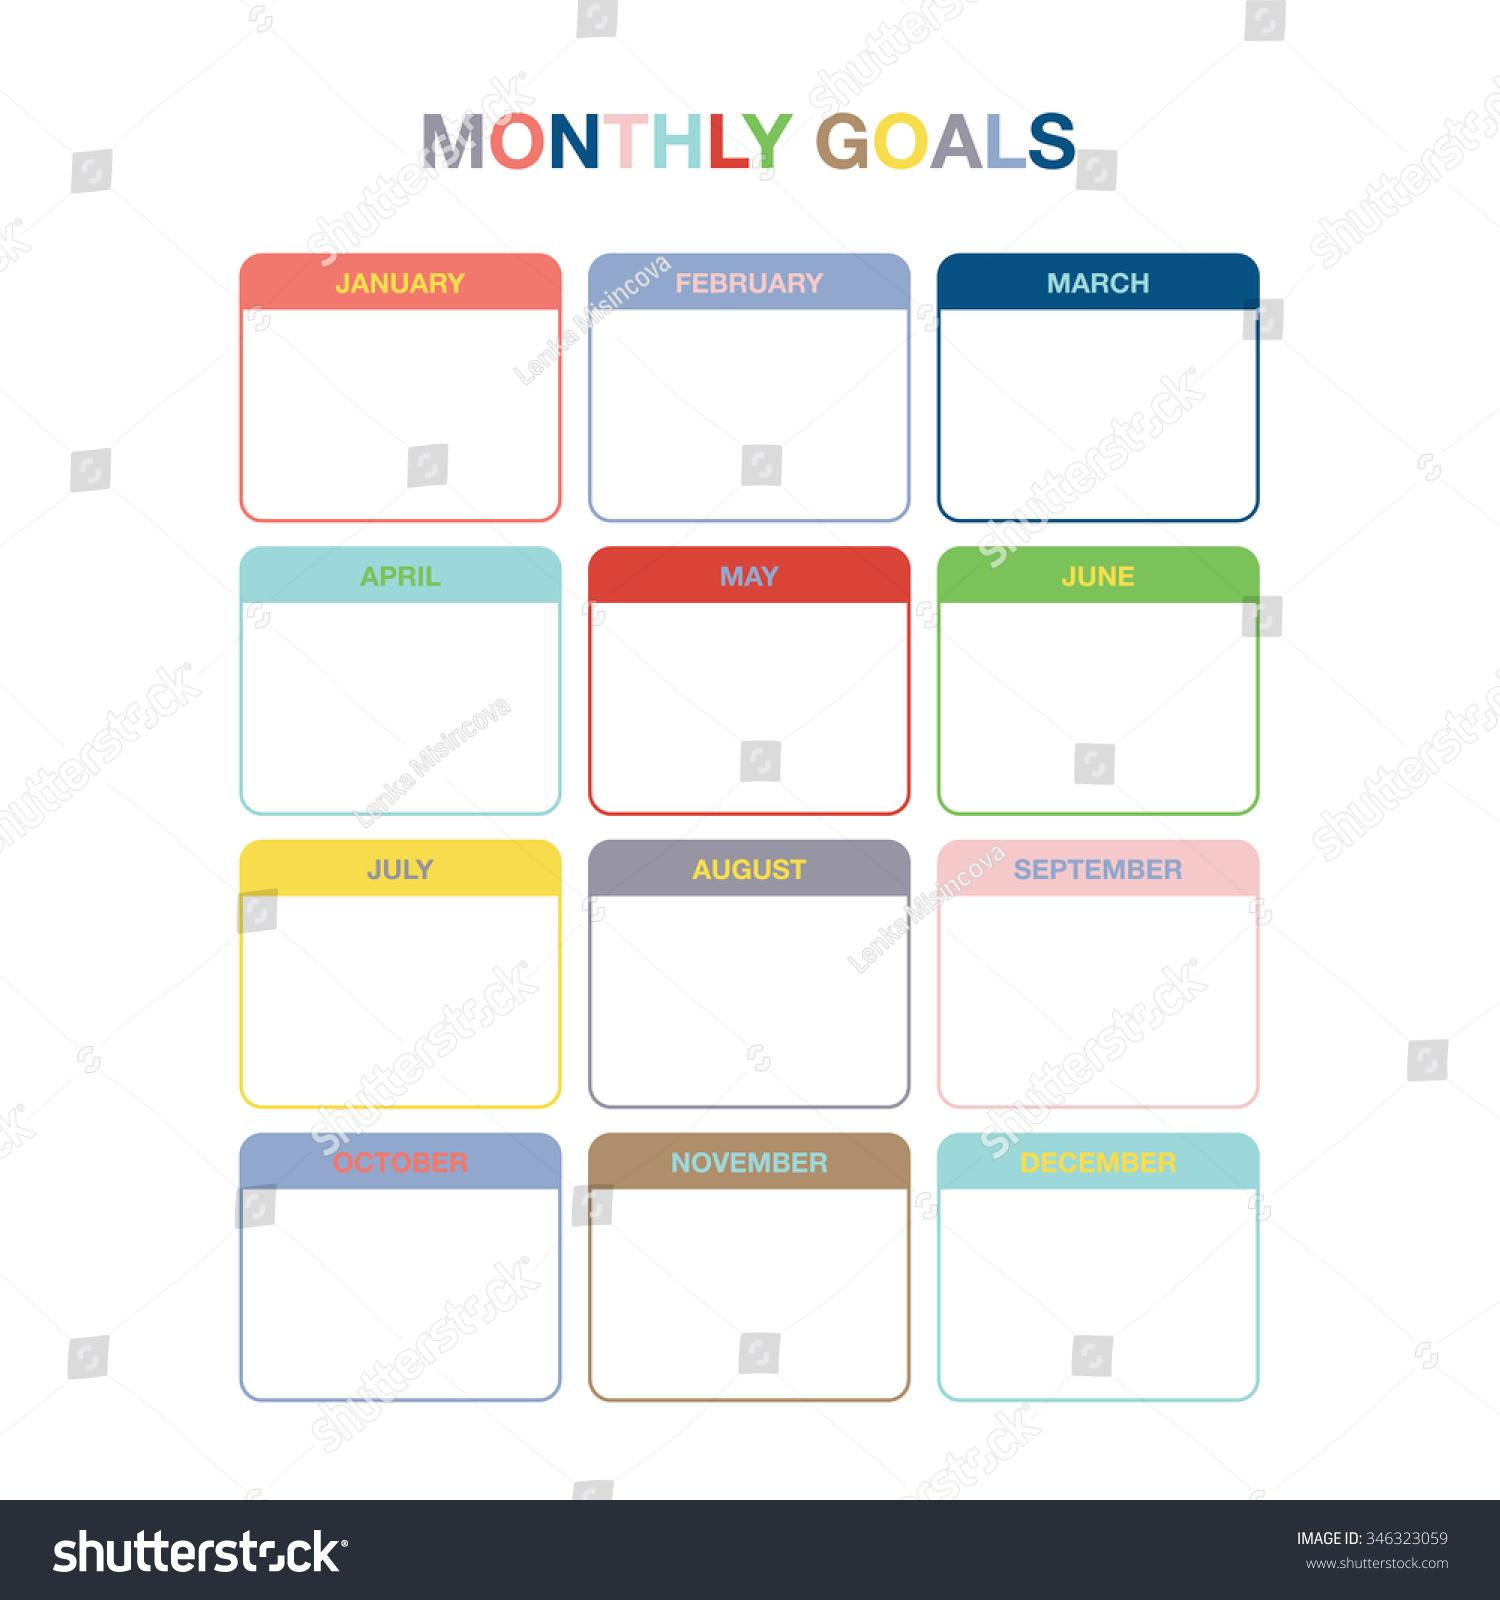 Monthly Goals Calendar Template Year Stock Vector